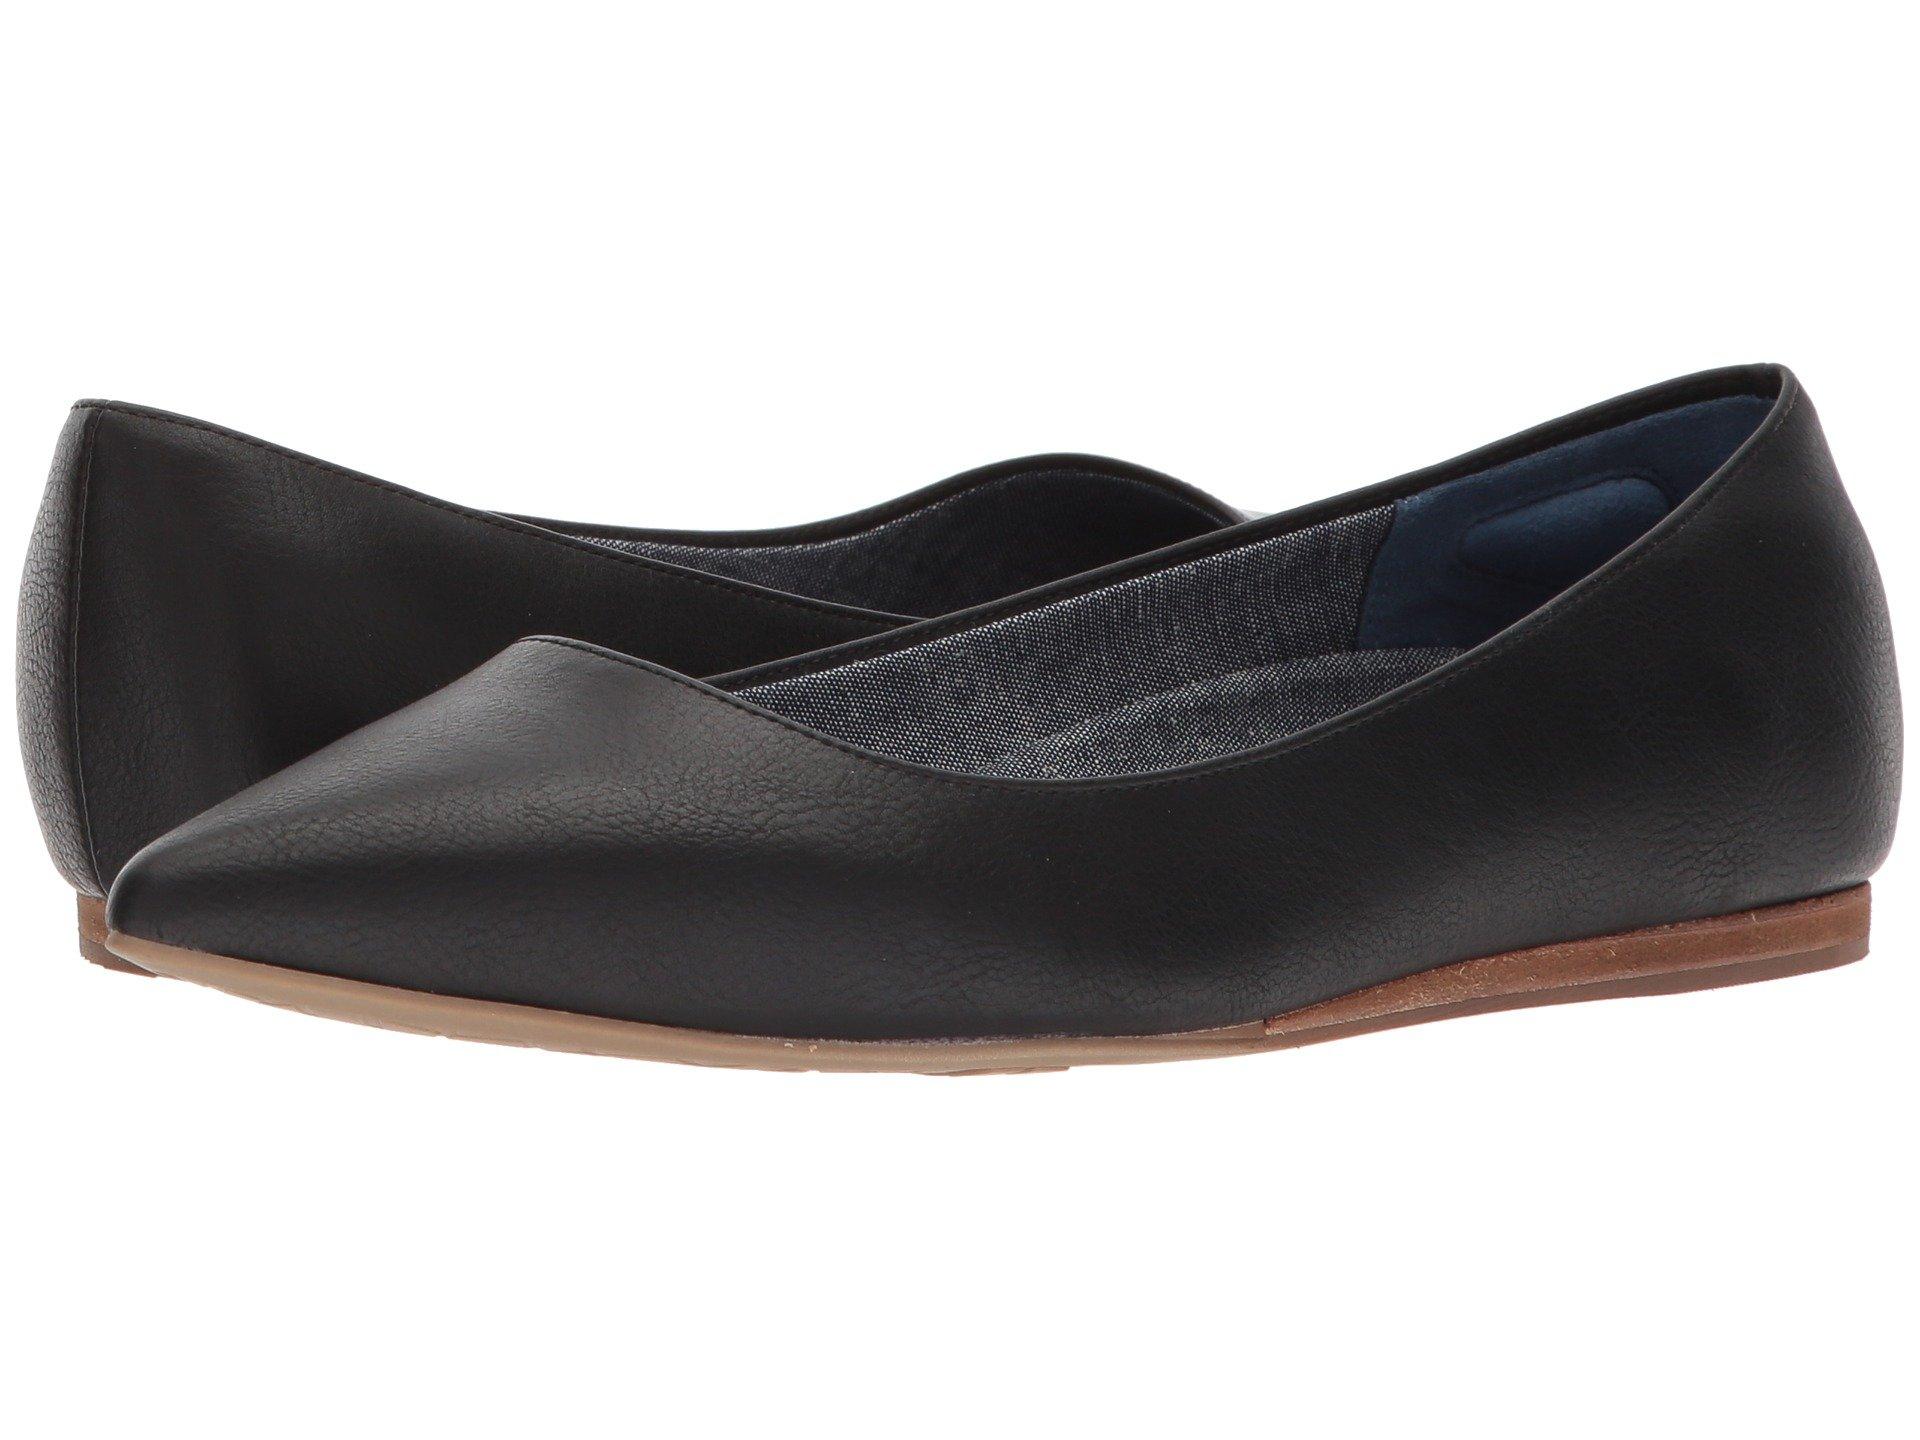 Dr. Scholl's Shoes Women's Leader Ballet Flat 7.5